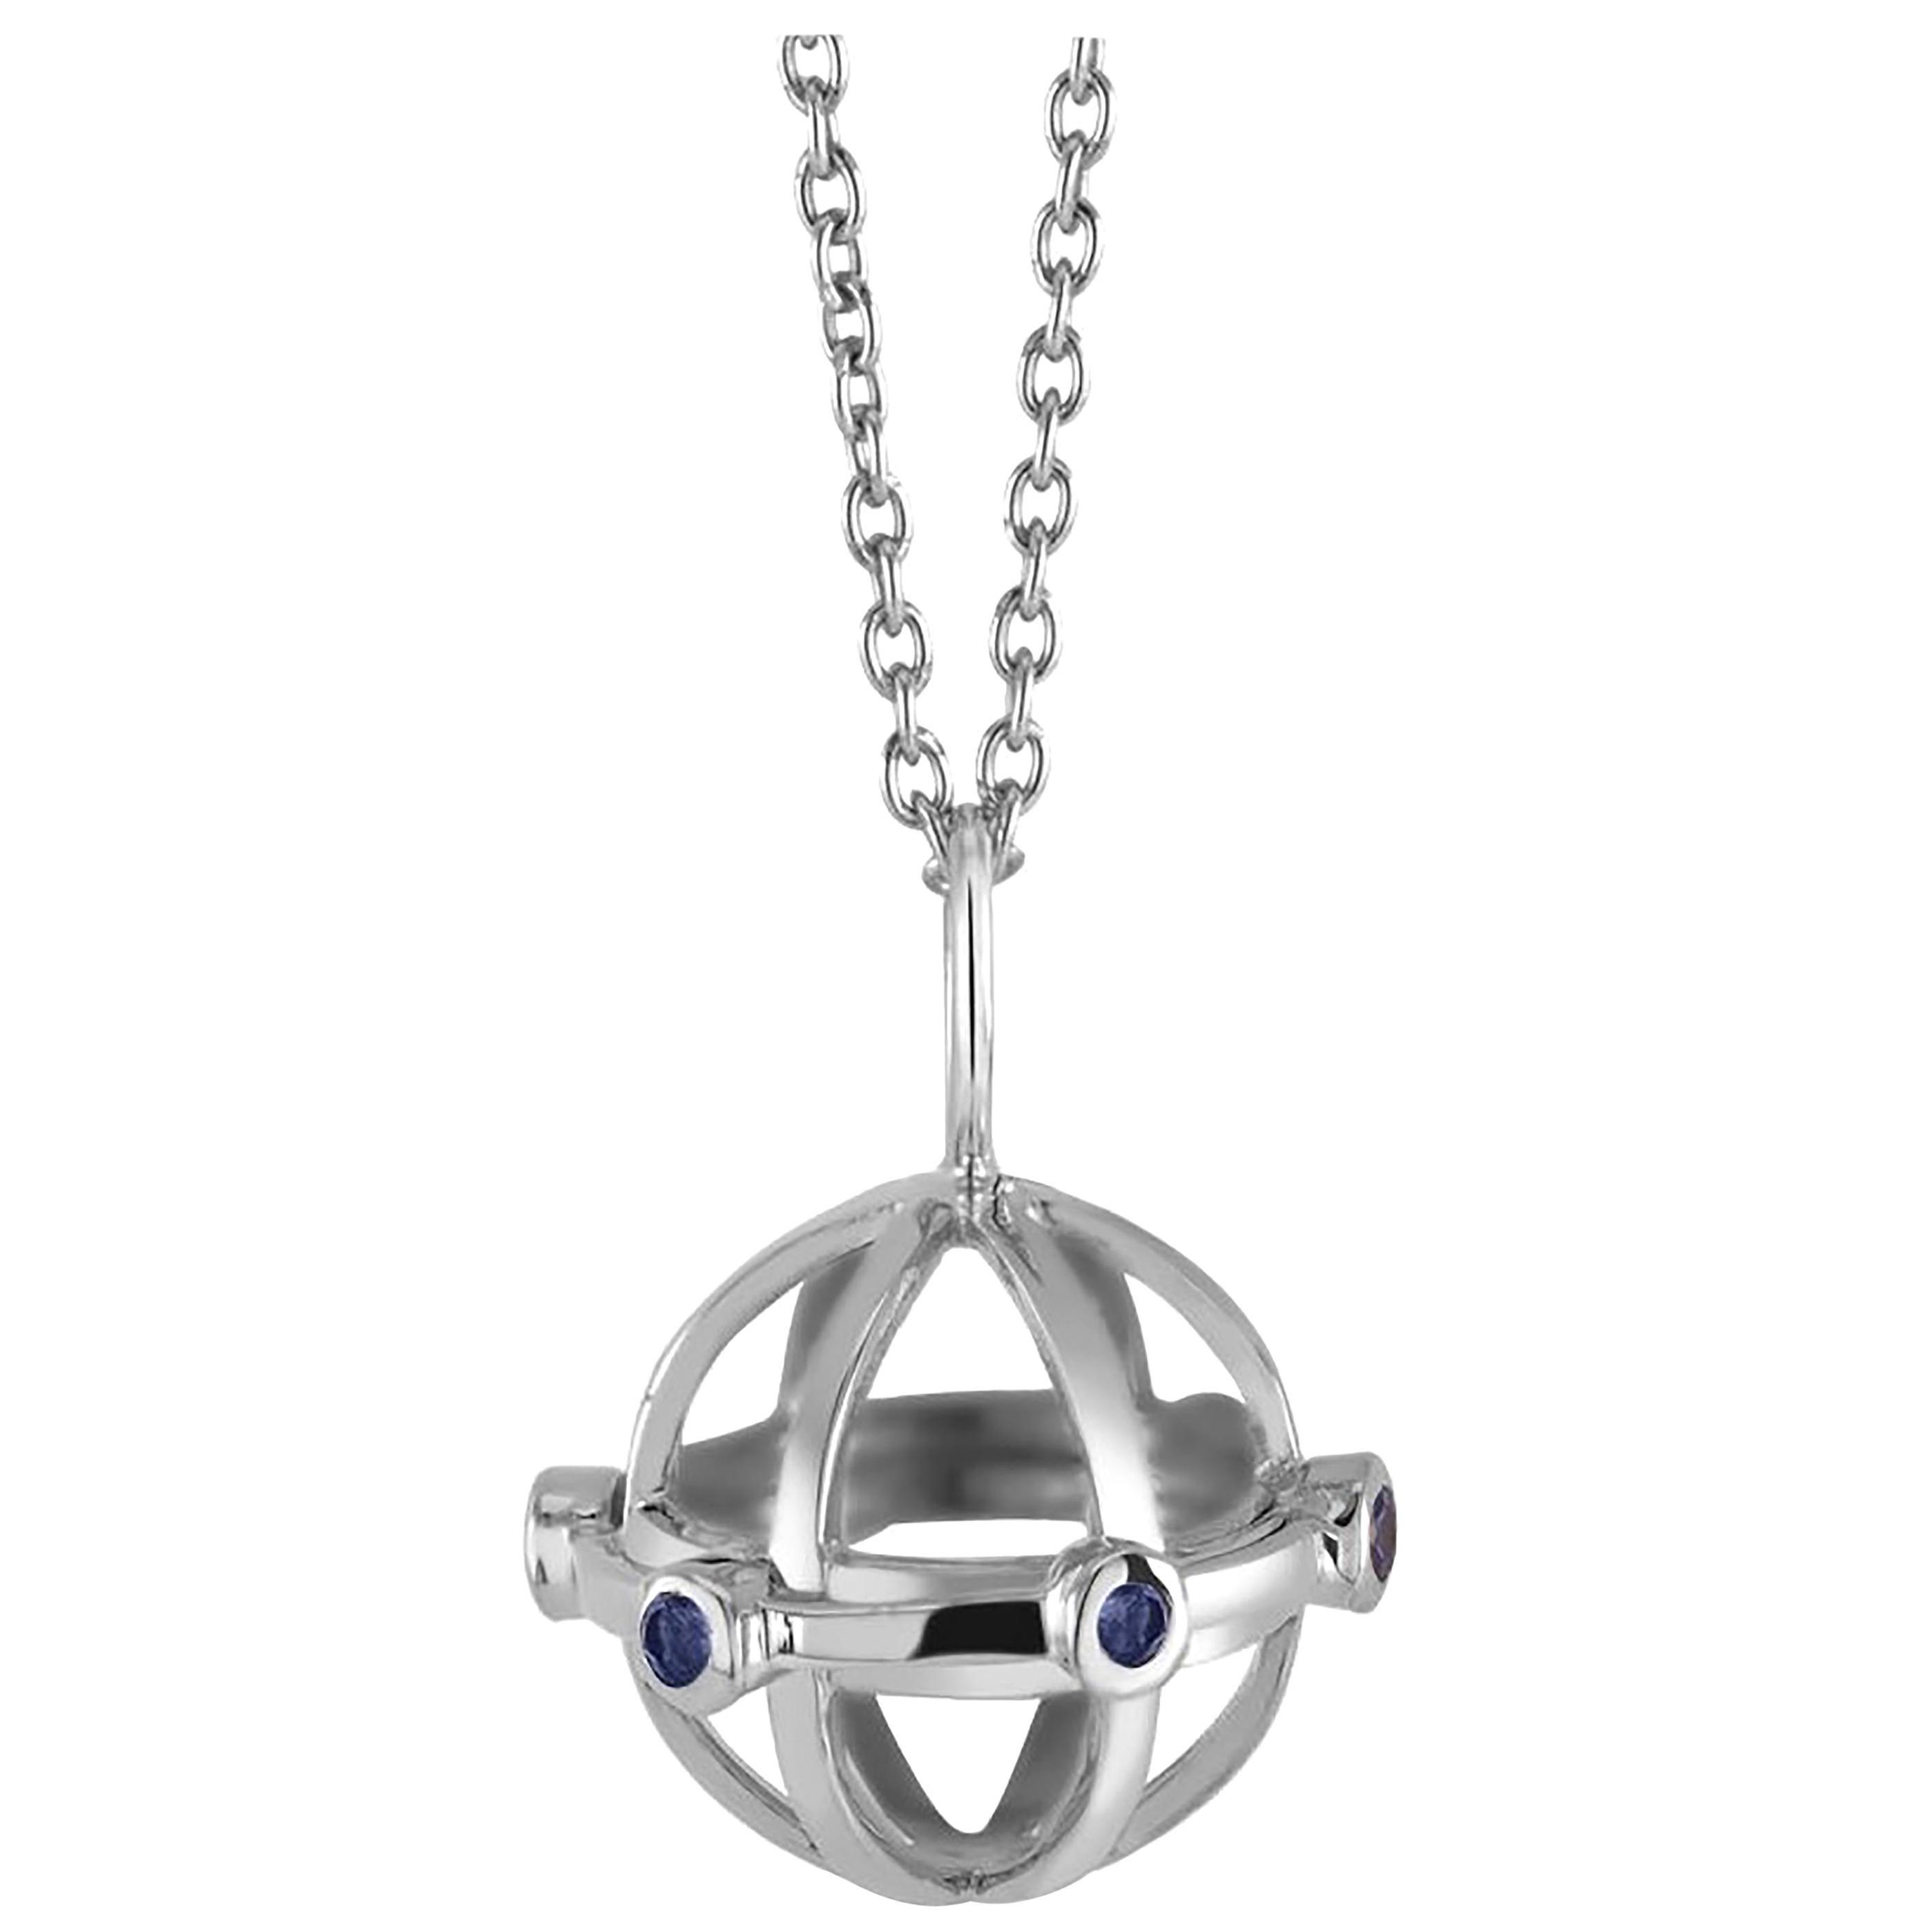 Globe Shape Sapphire Charm Silver Pendant Necklace